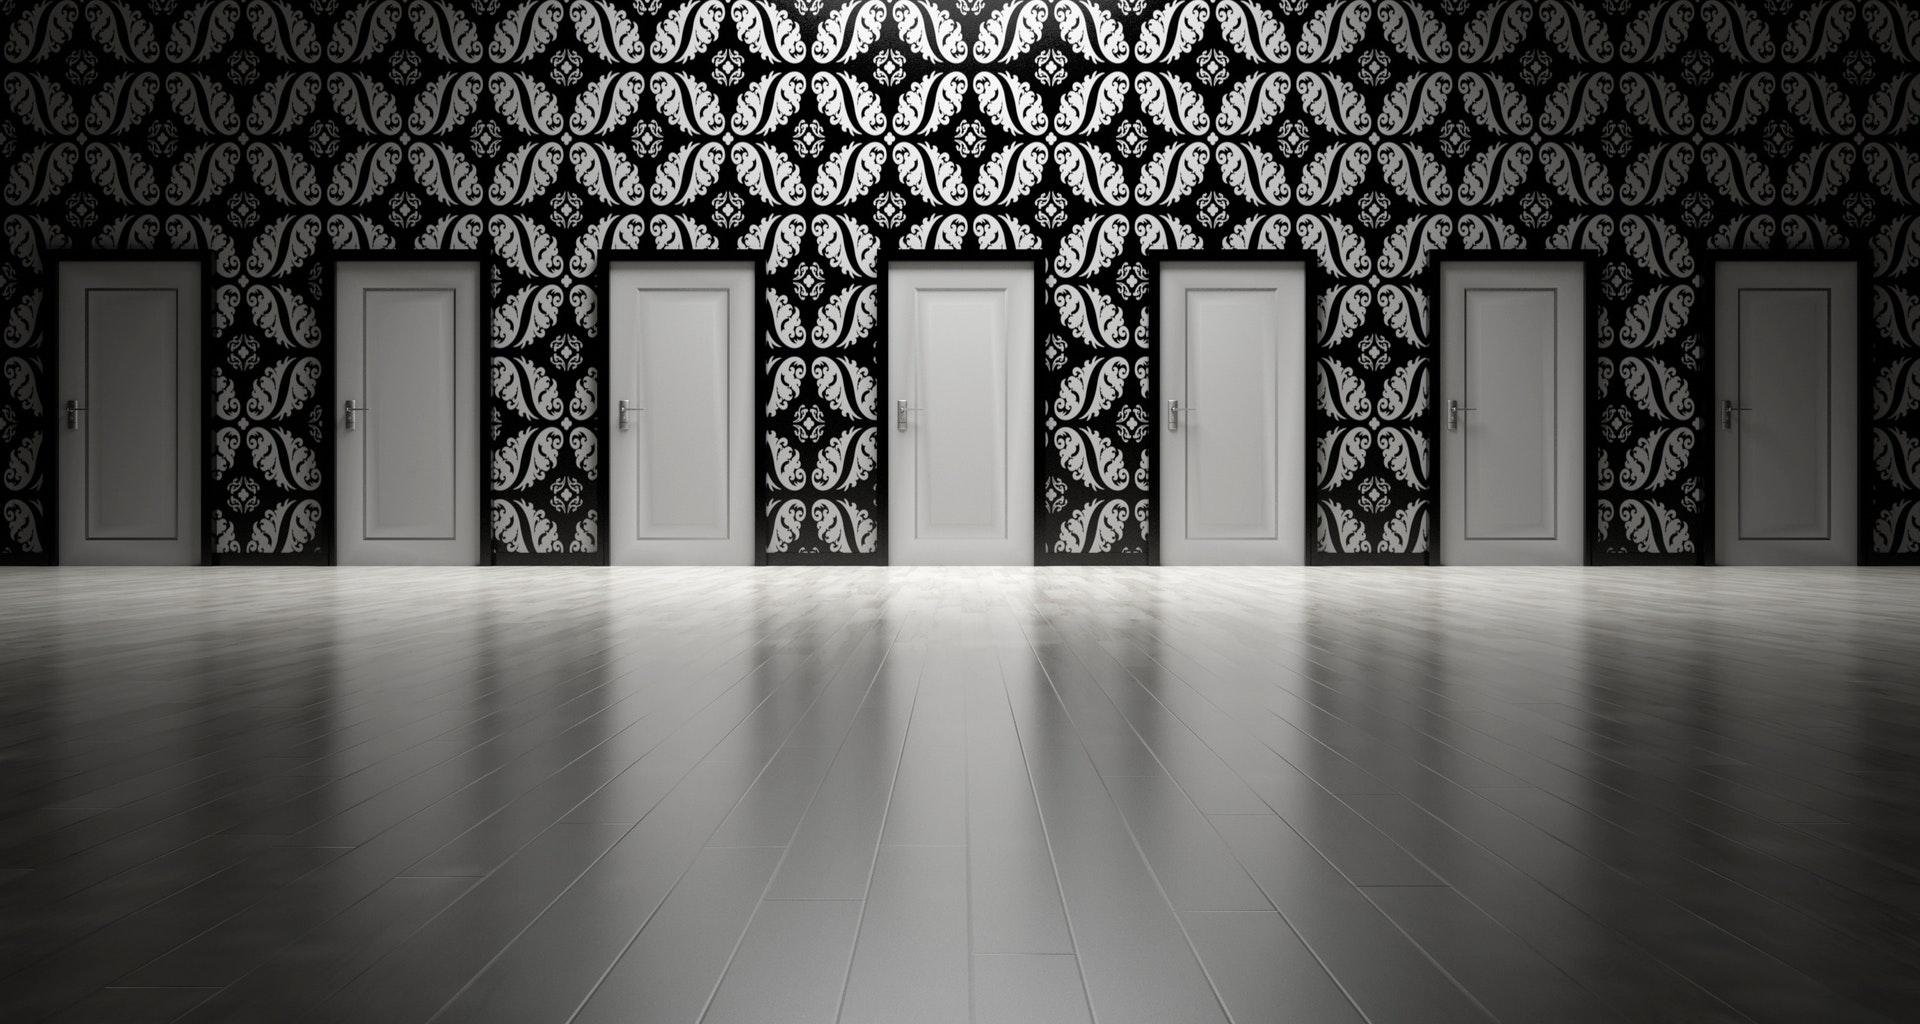 Le sette porte